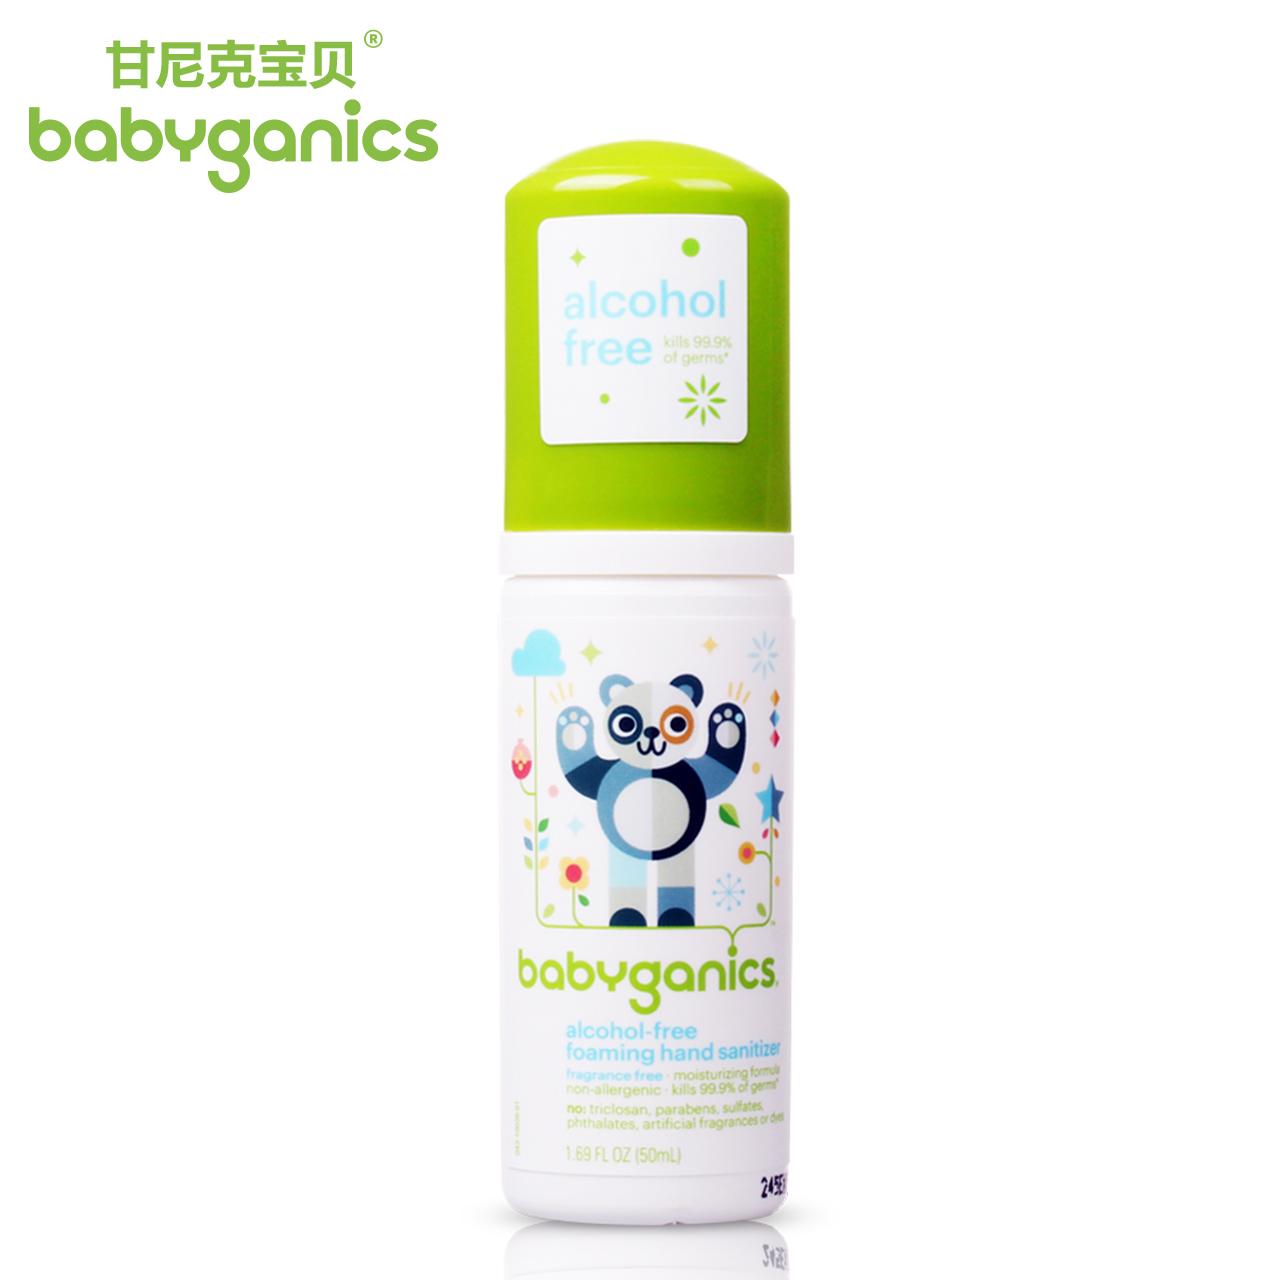 BabyGanics甘尼克免洗洗手液無香泡沫嬰兒寶寶兒童便攜洗手液50ml